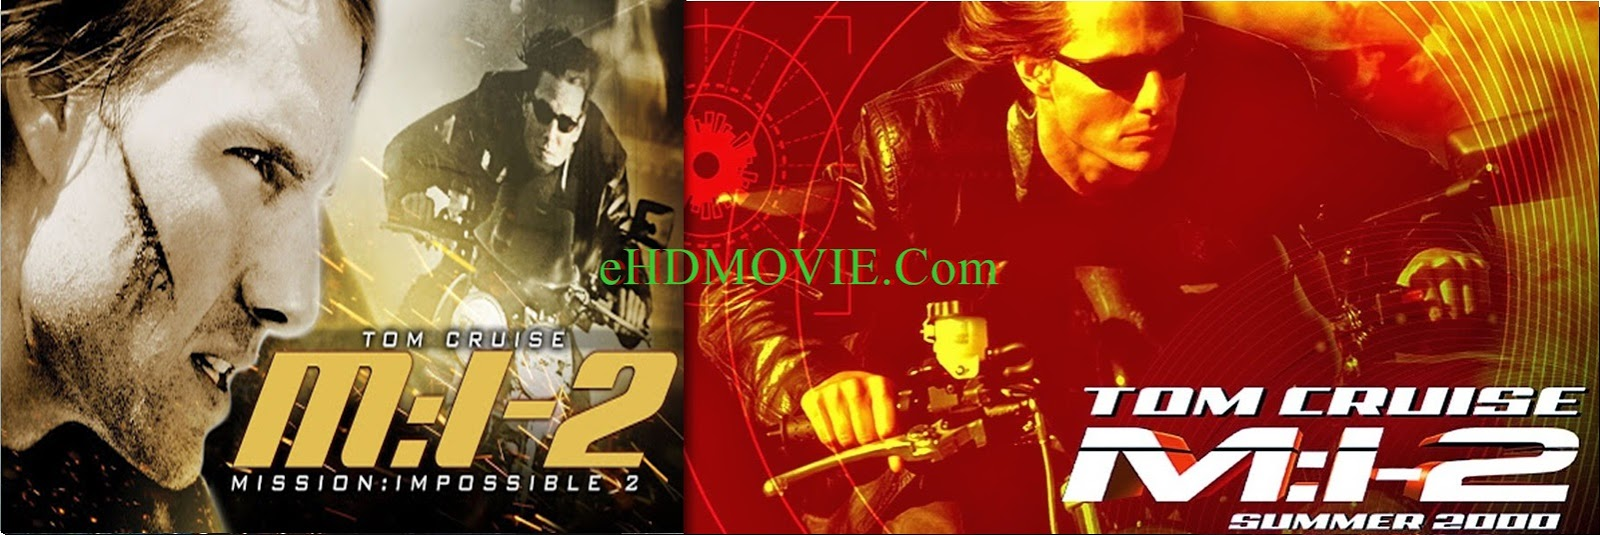 Mission: Impossible II 2000 Full Movie Dual Audio [Hindi – English] 1080p - 720p - 480p ORG BRRip 350MB - 850MB - 2GB ESubs Free Download